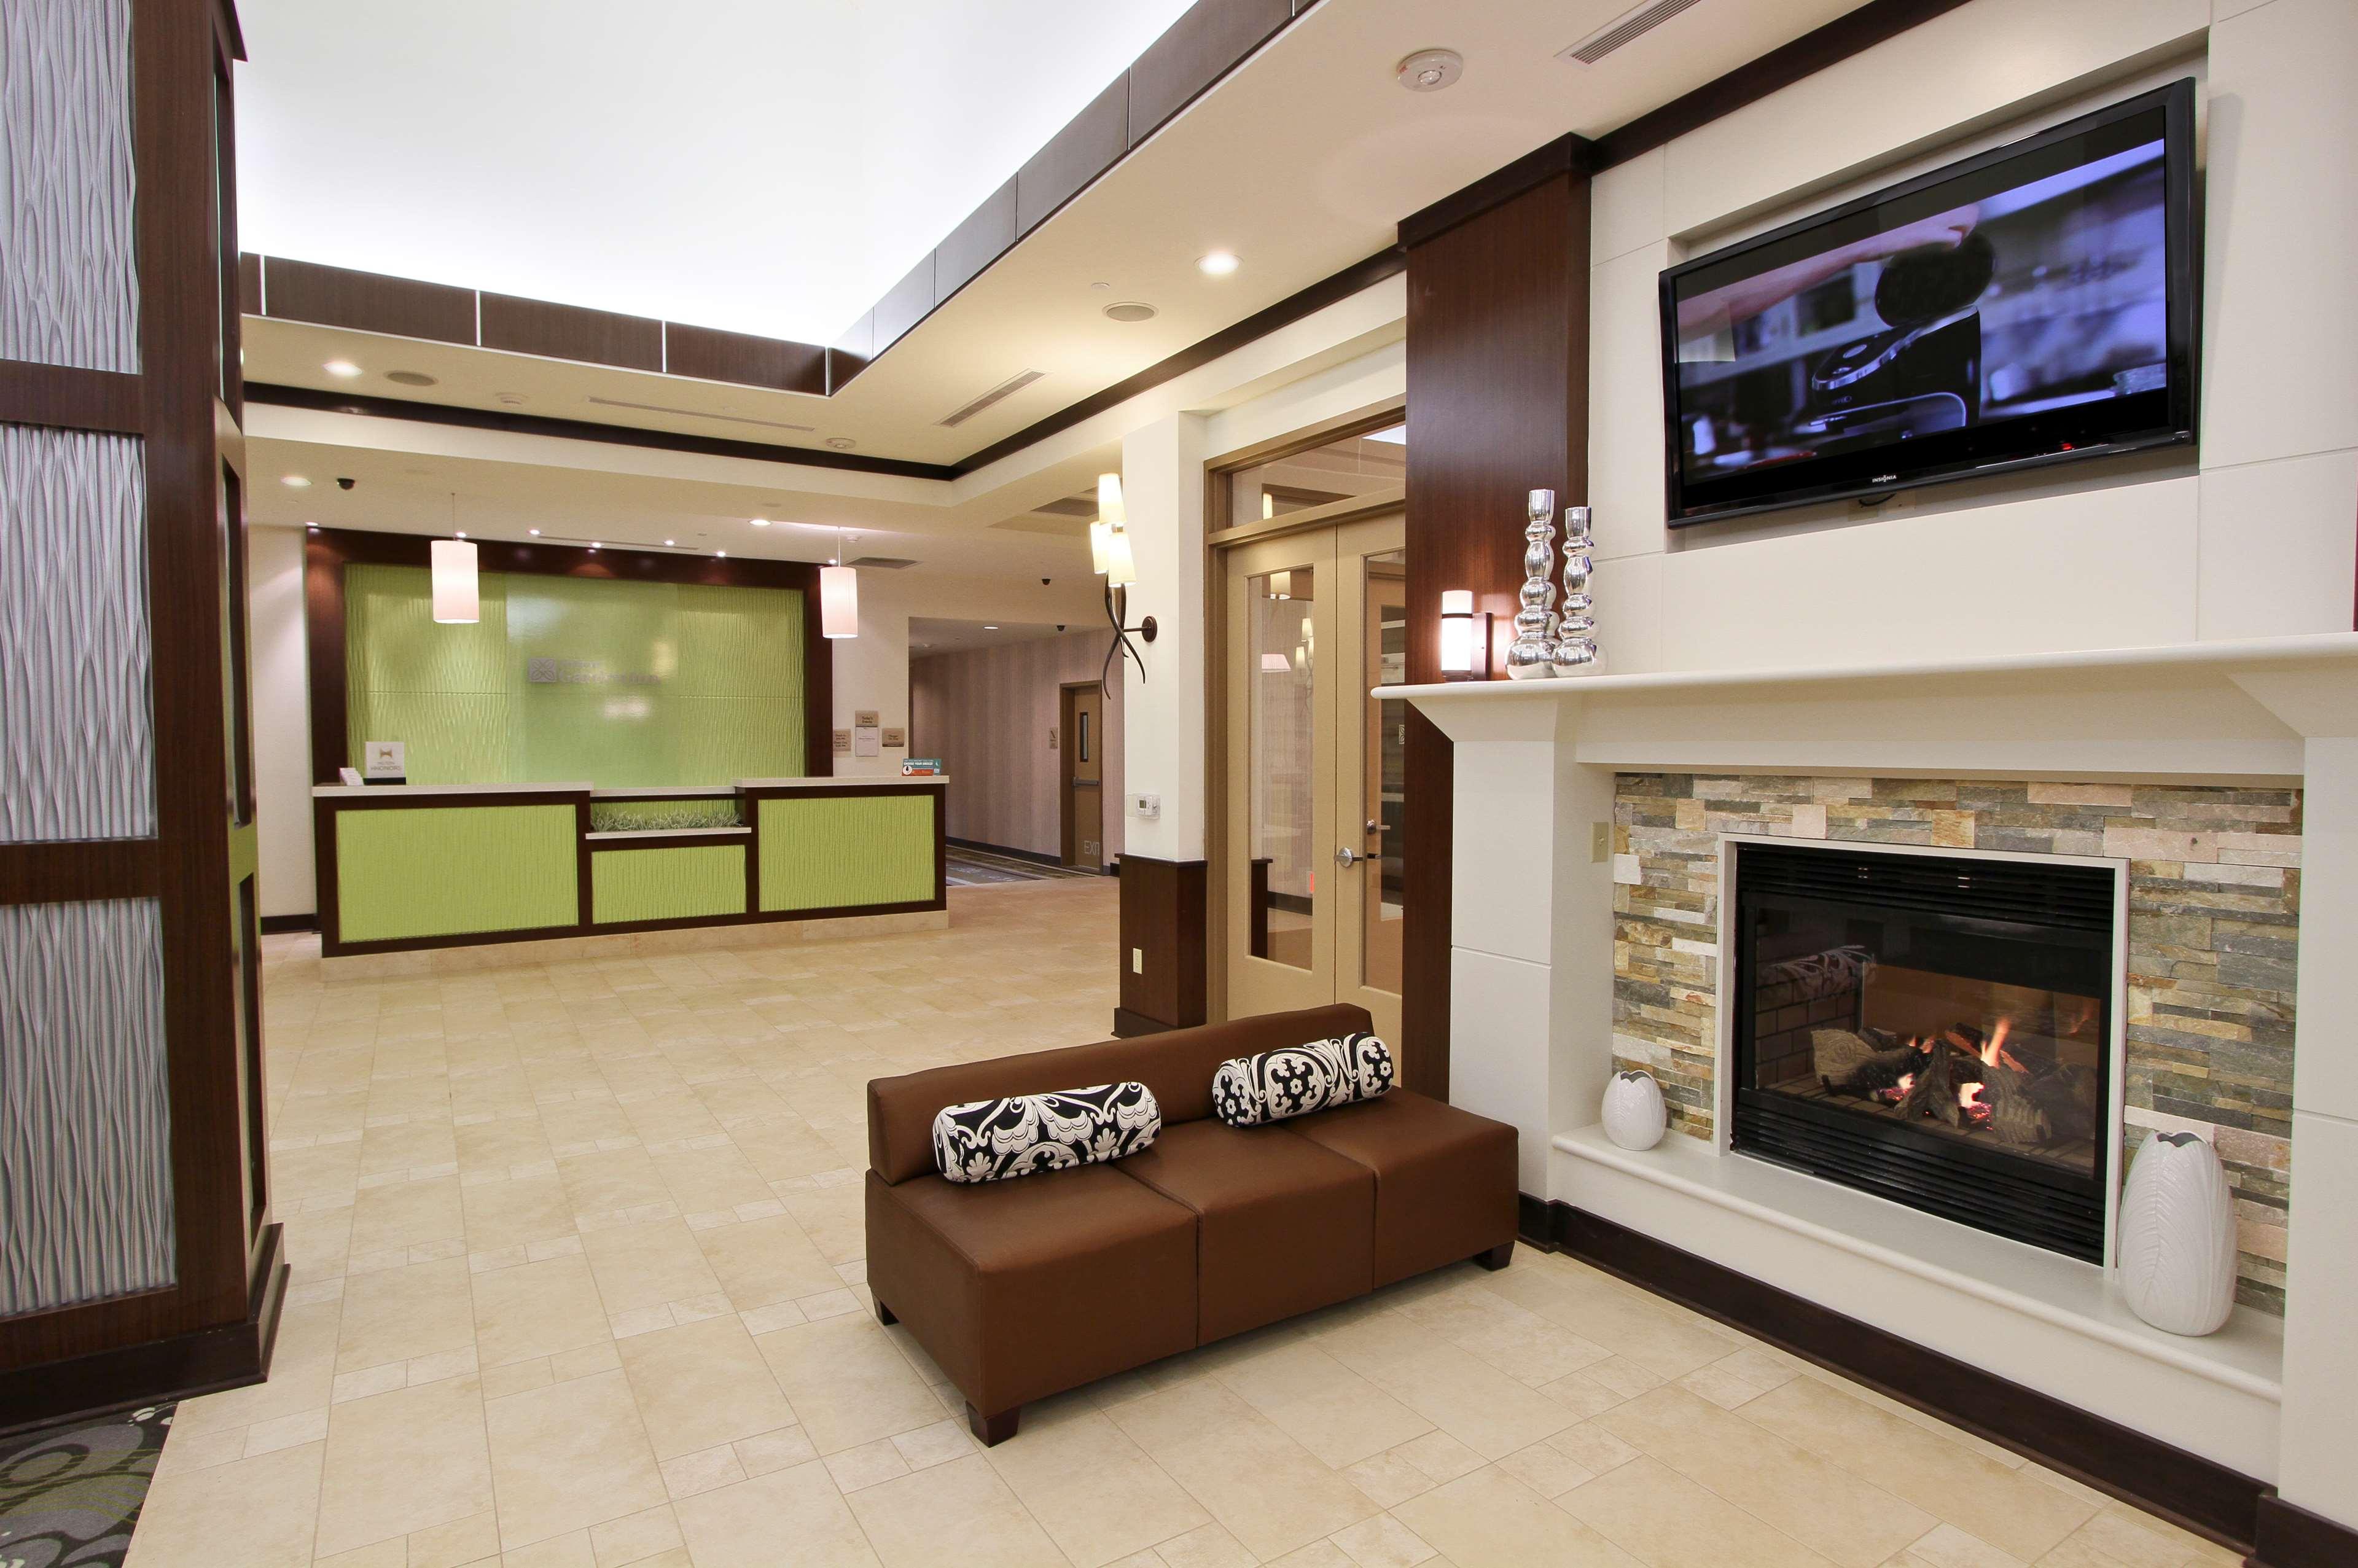 Hilton Garden Inn Covington/Mandeville image 4